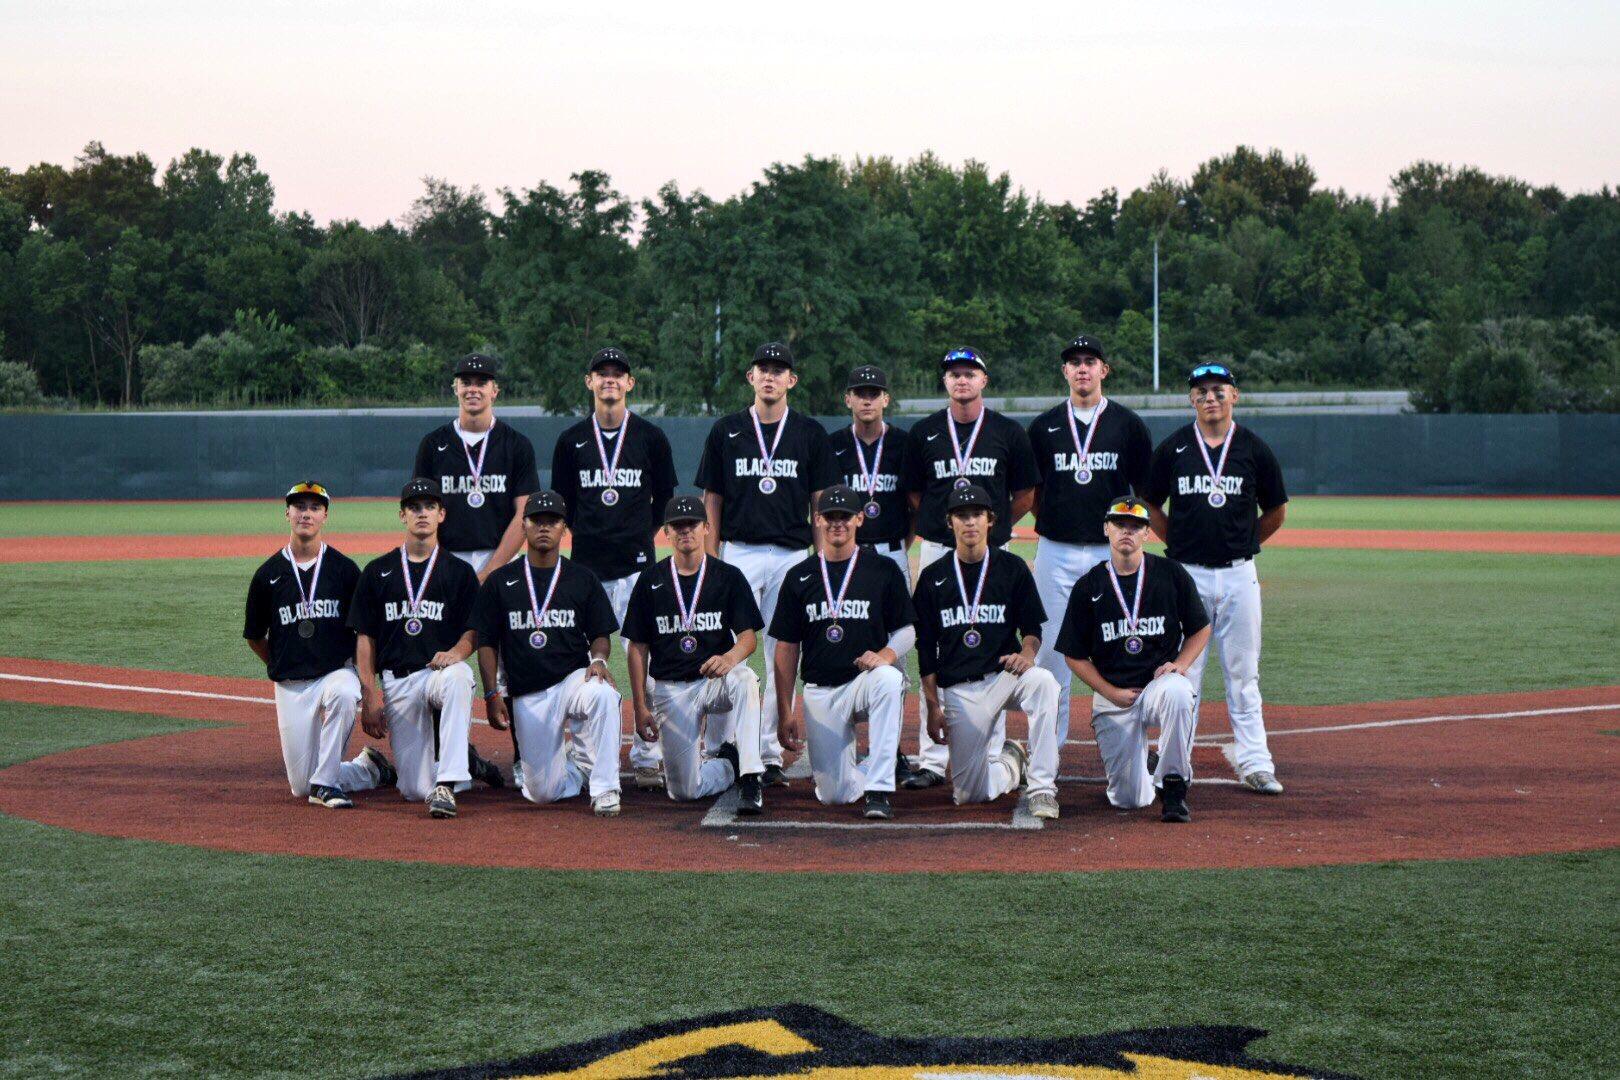 Travel Baseball Team Tryouts | Bo Jackson's Elite Sports